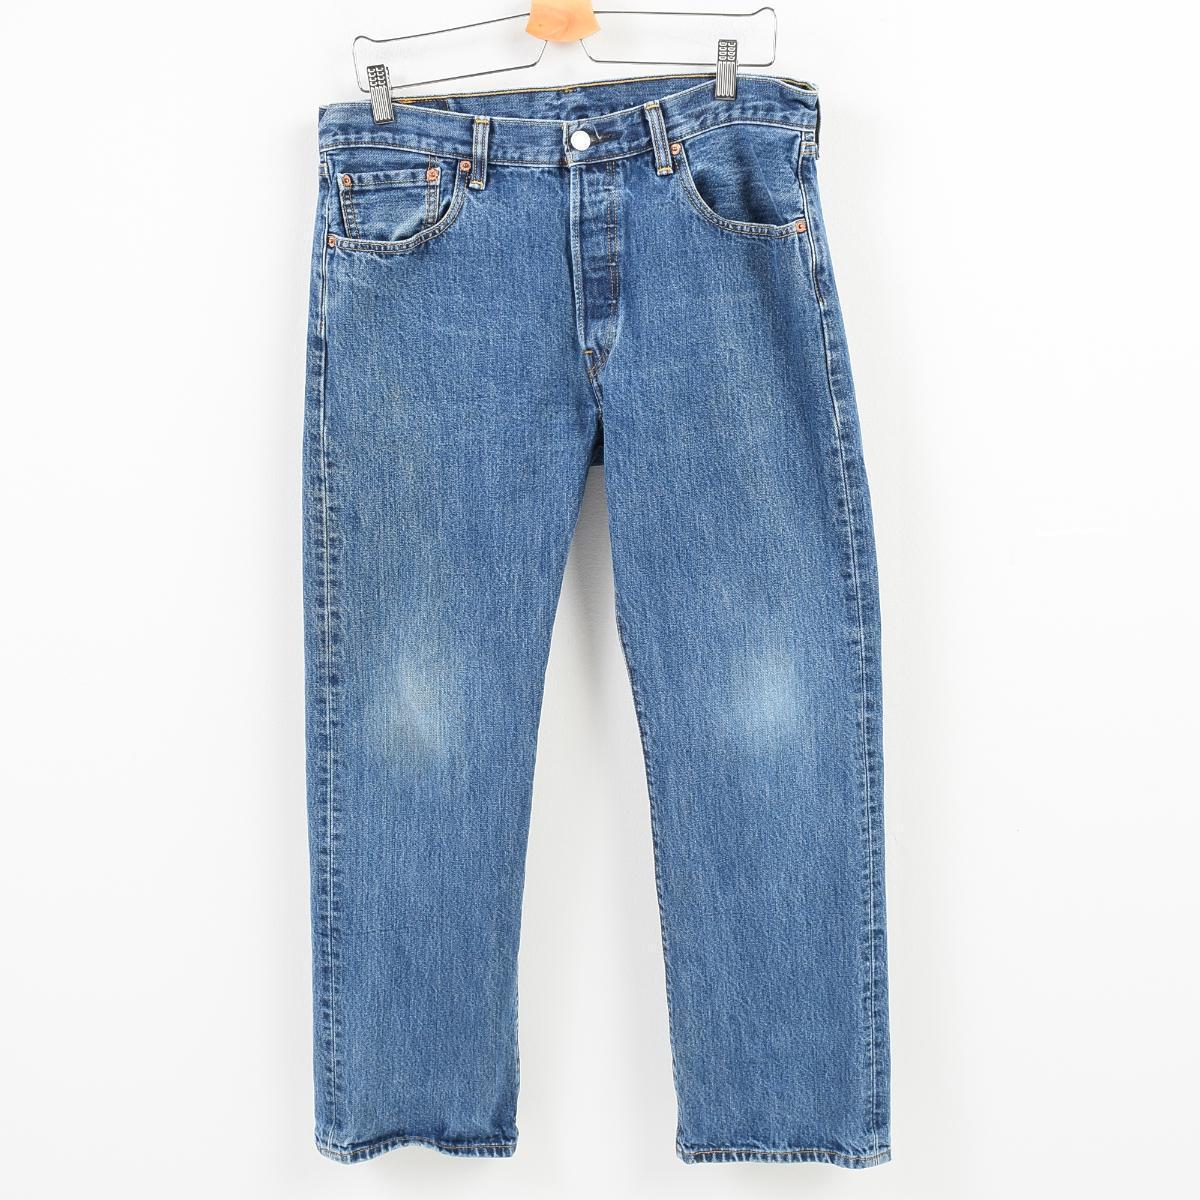 levis 牛仔裤 版 型 介绍